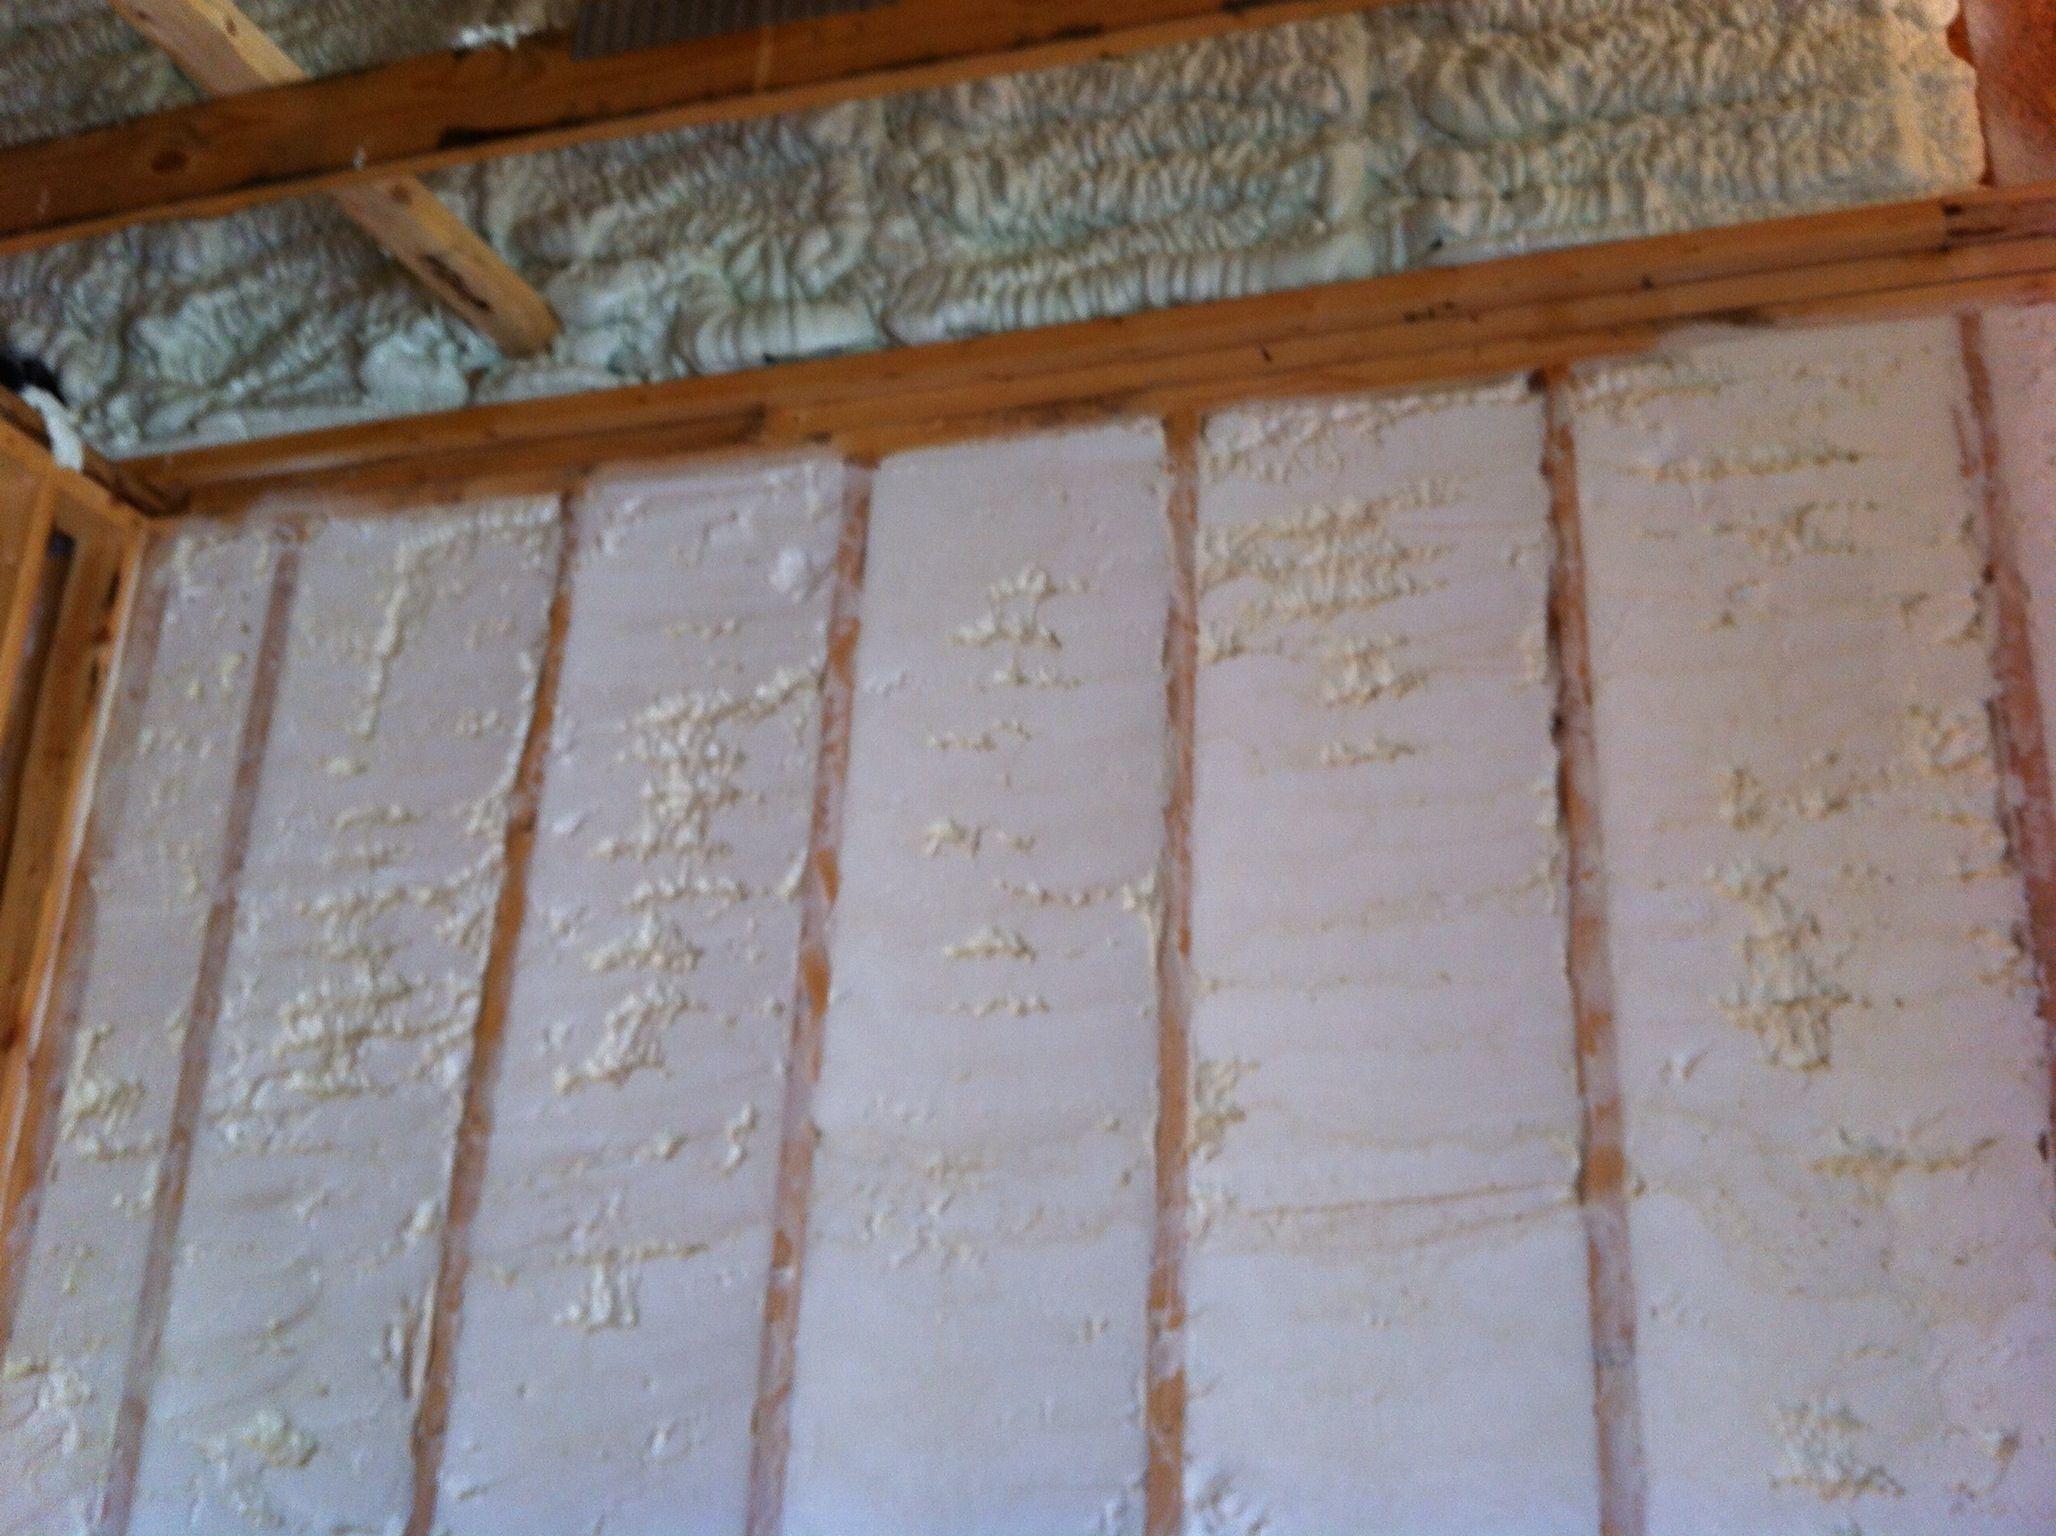 Spray foam insulation open cell vs closed cell - Open Cell Spray Foam Insulation On The Exterior Walls And Closed Cell Spray Foam In The